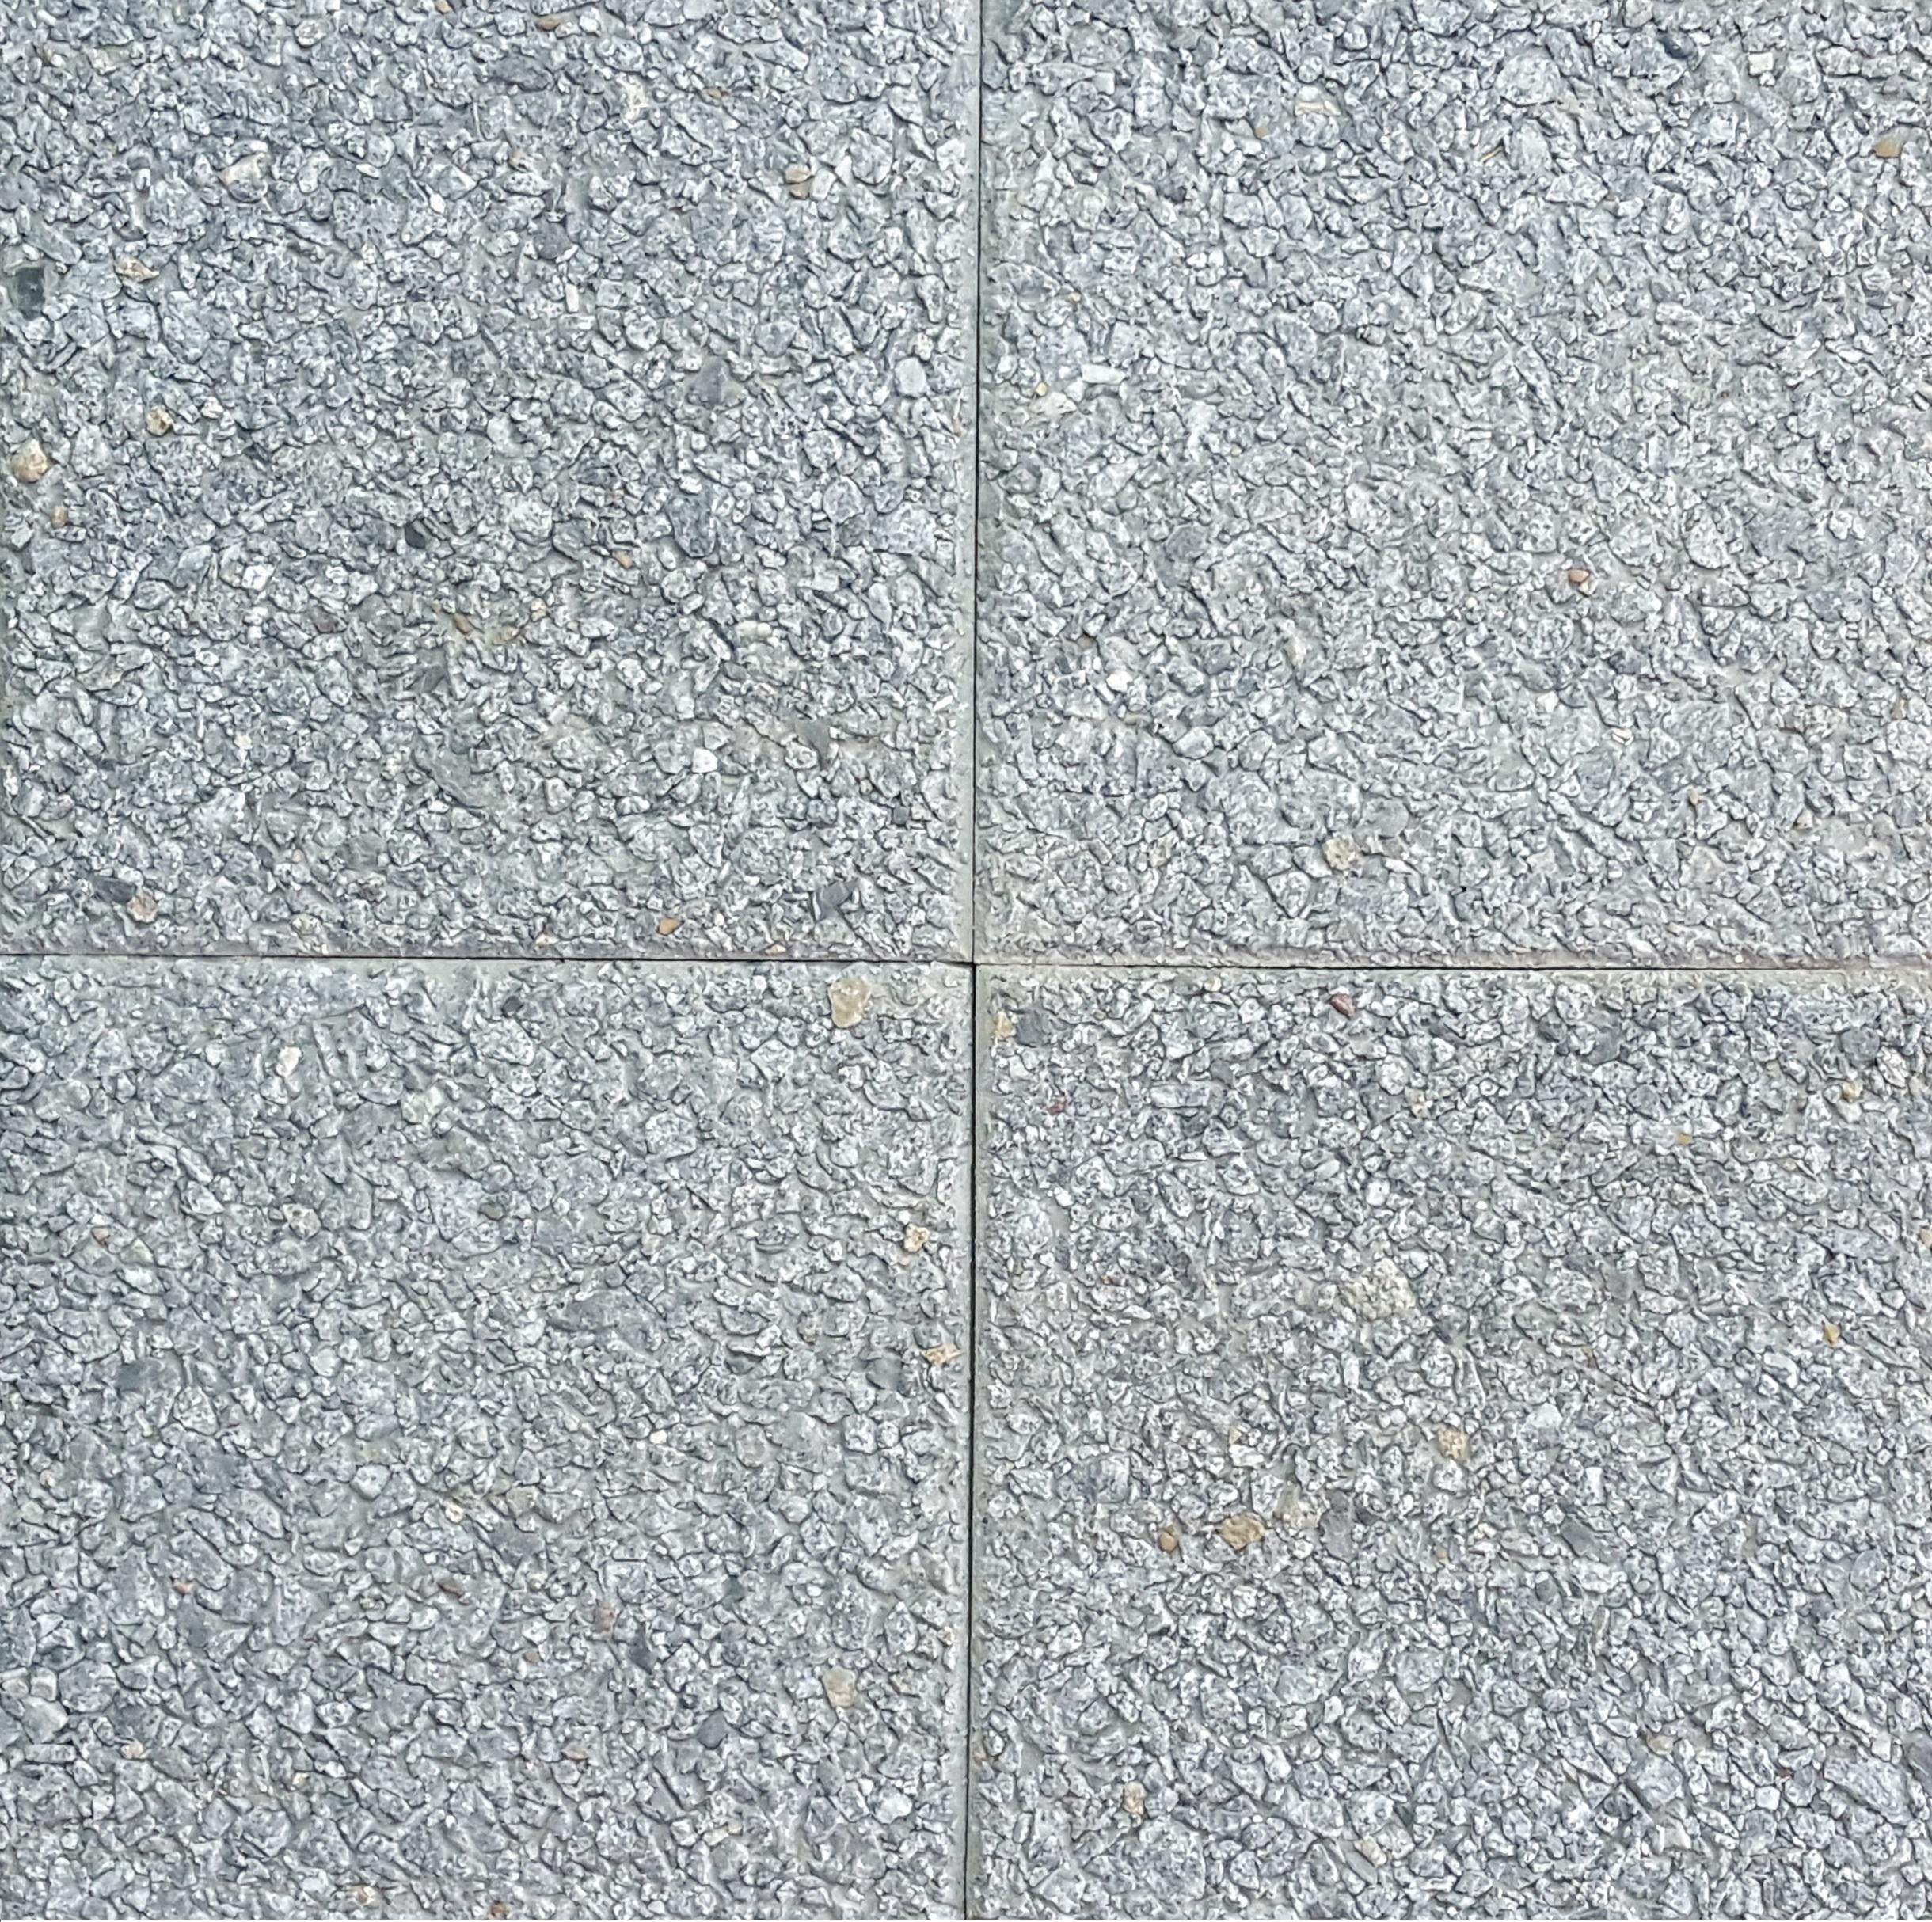 70 baldosas para veredas patios pisos f brica en zona Baldosa pared piedra